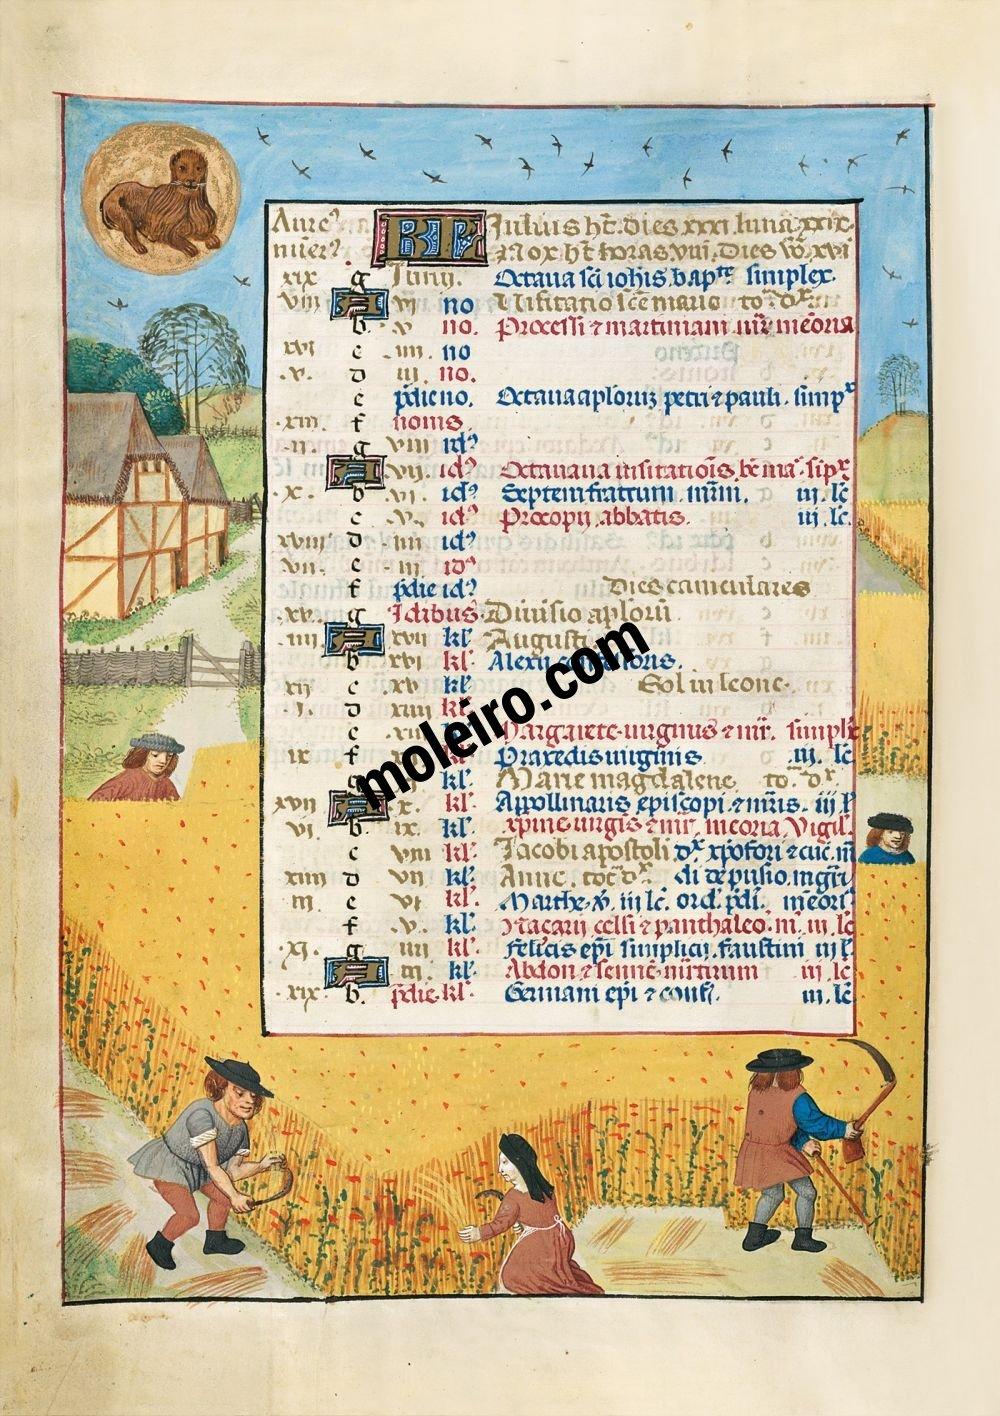 The Isabella Breviary f. 4v, July